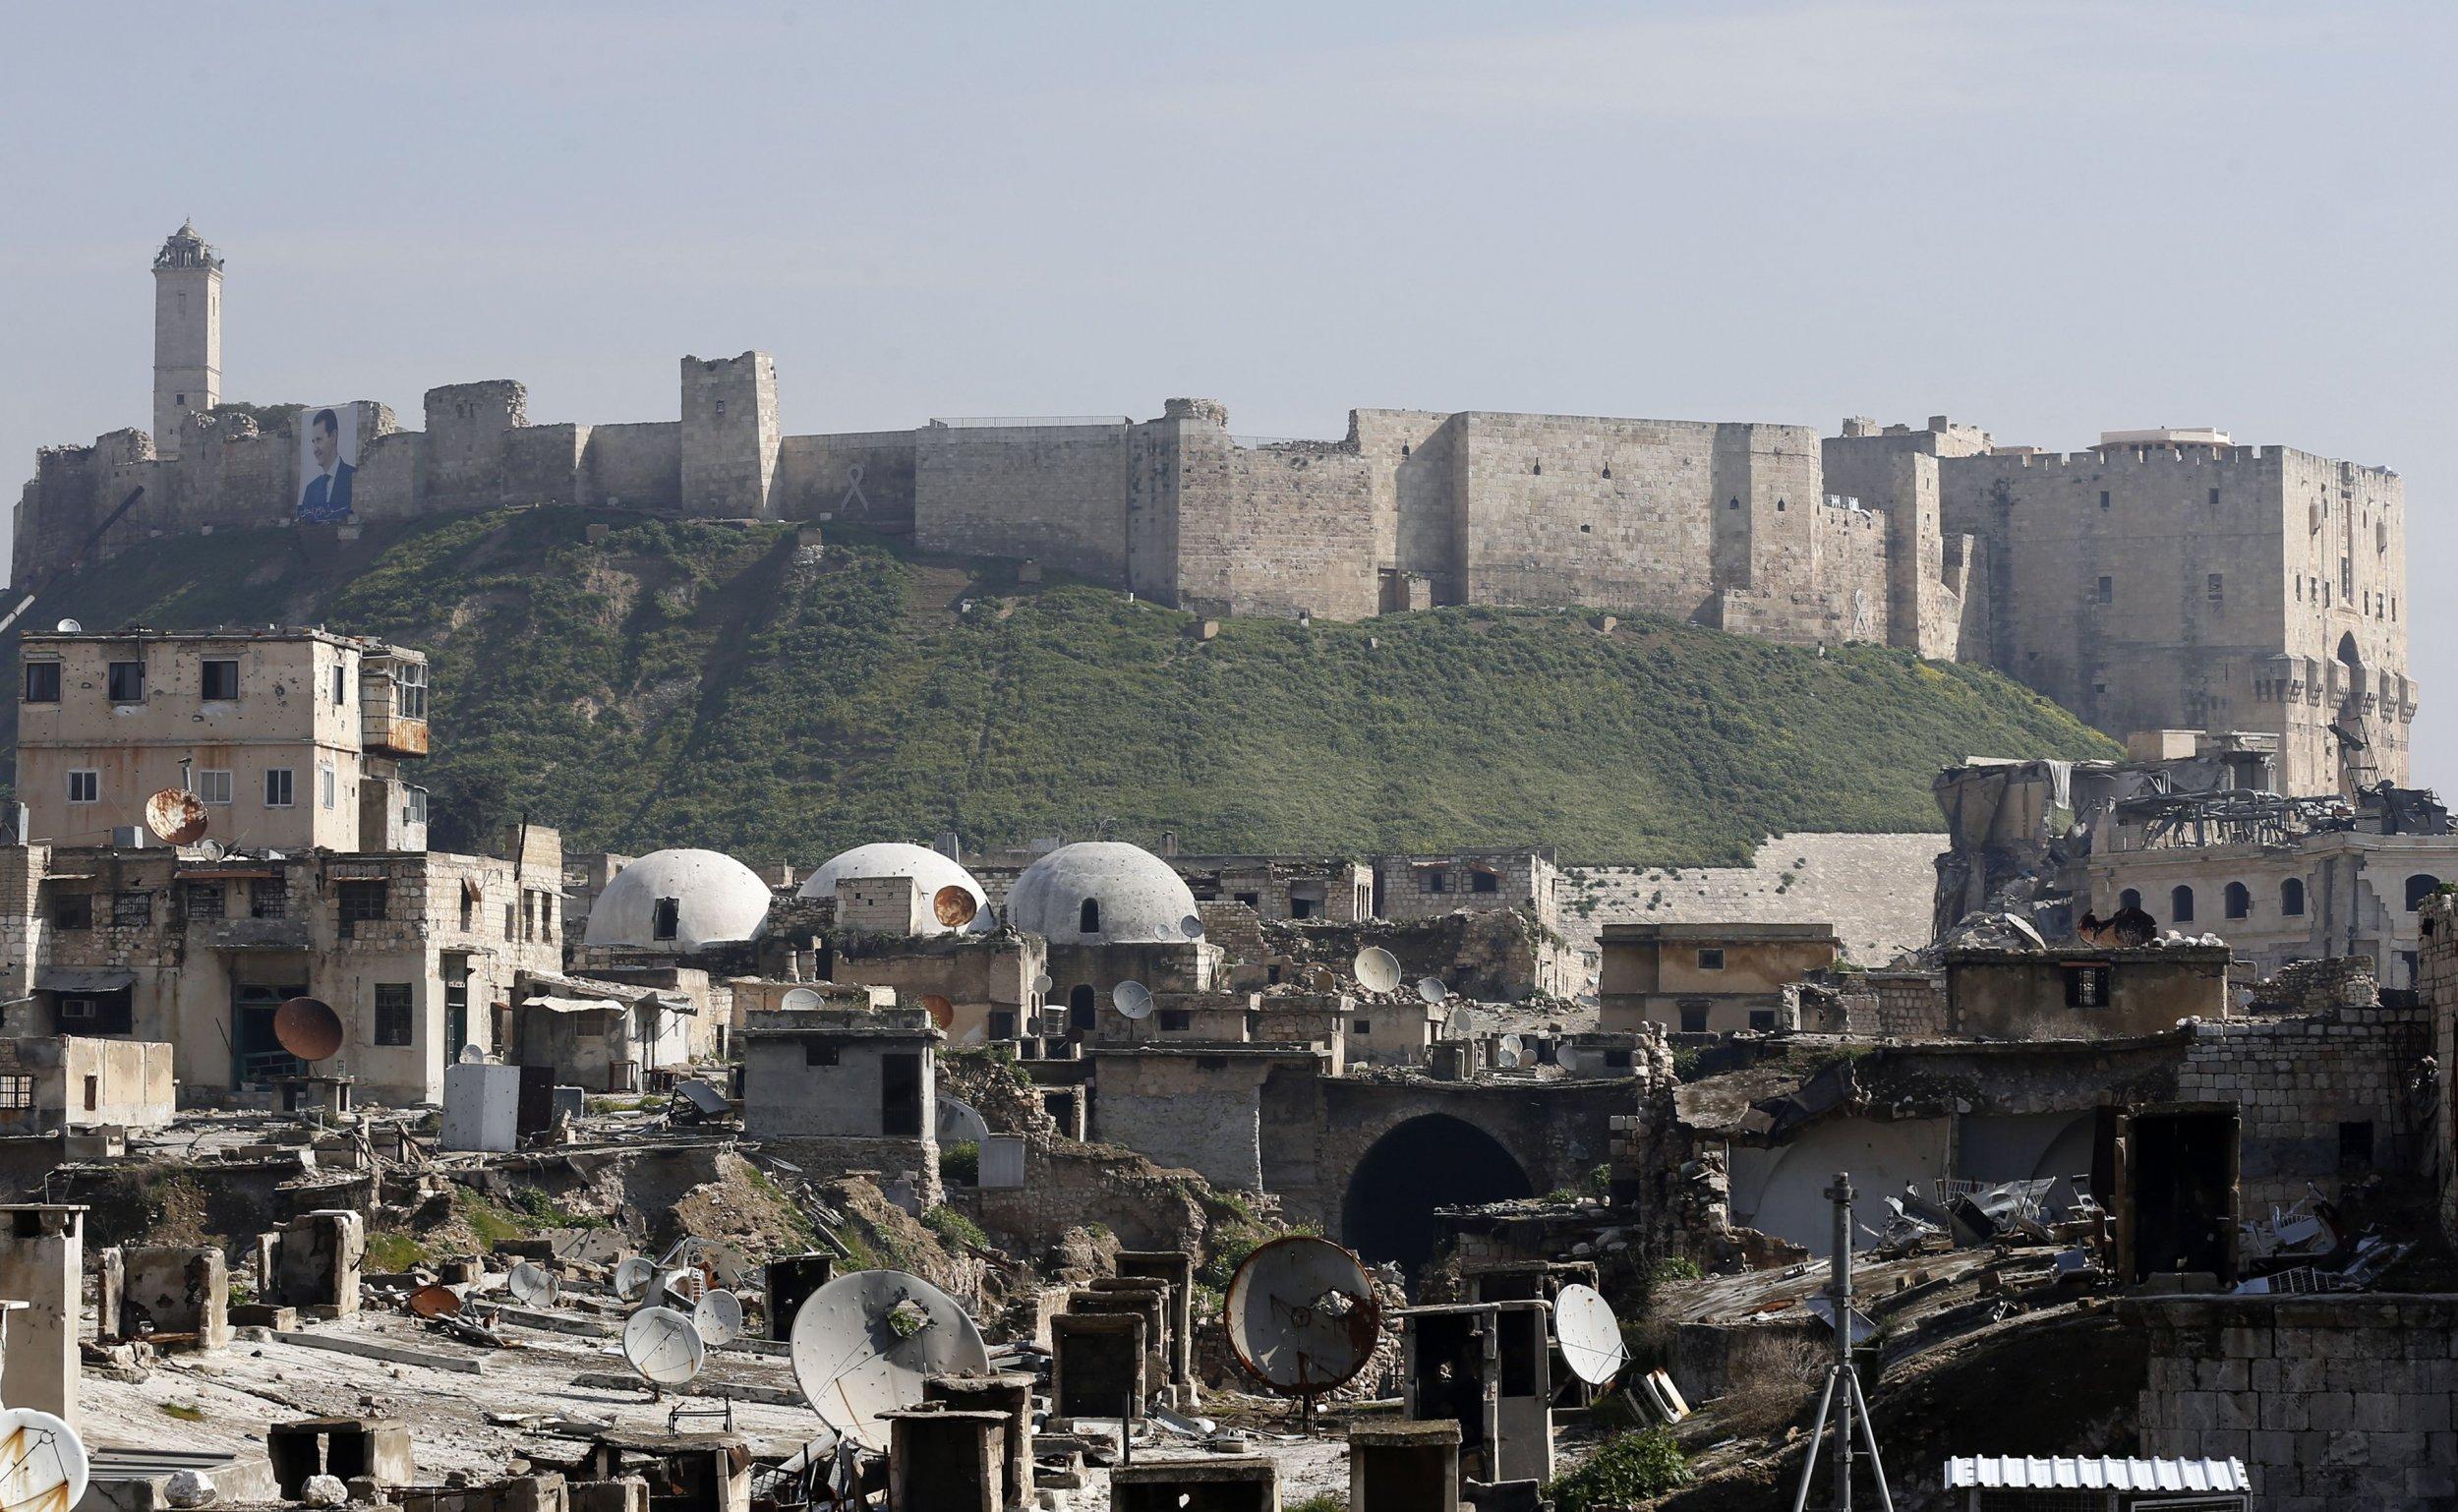 syria war, what;s happening idlib